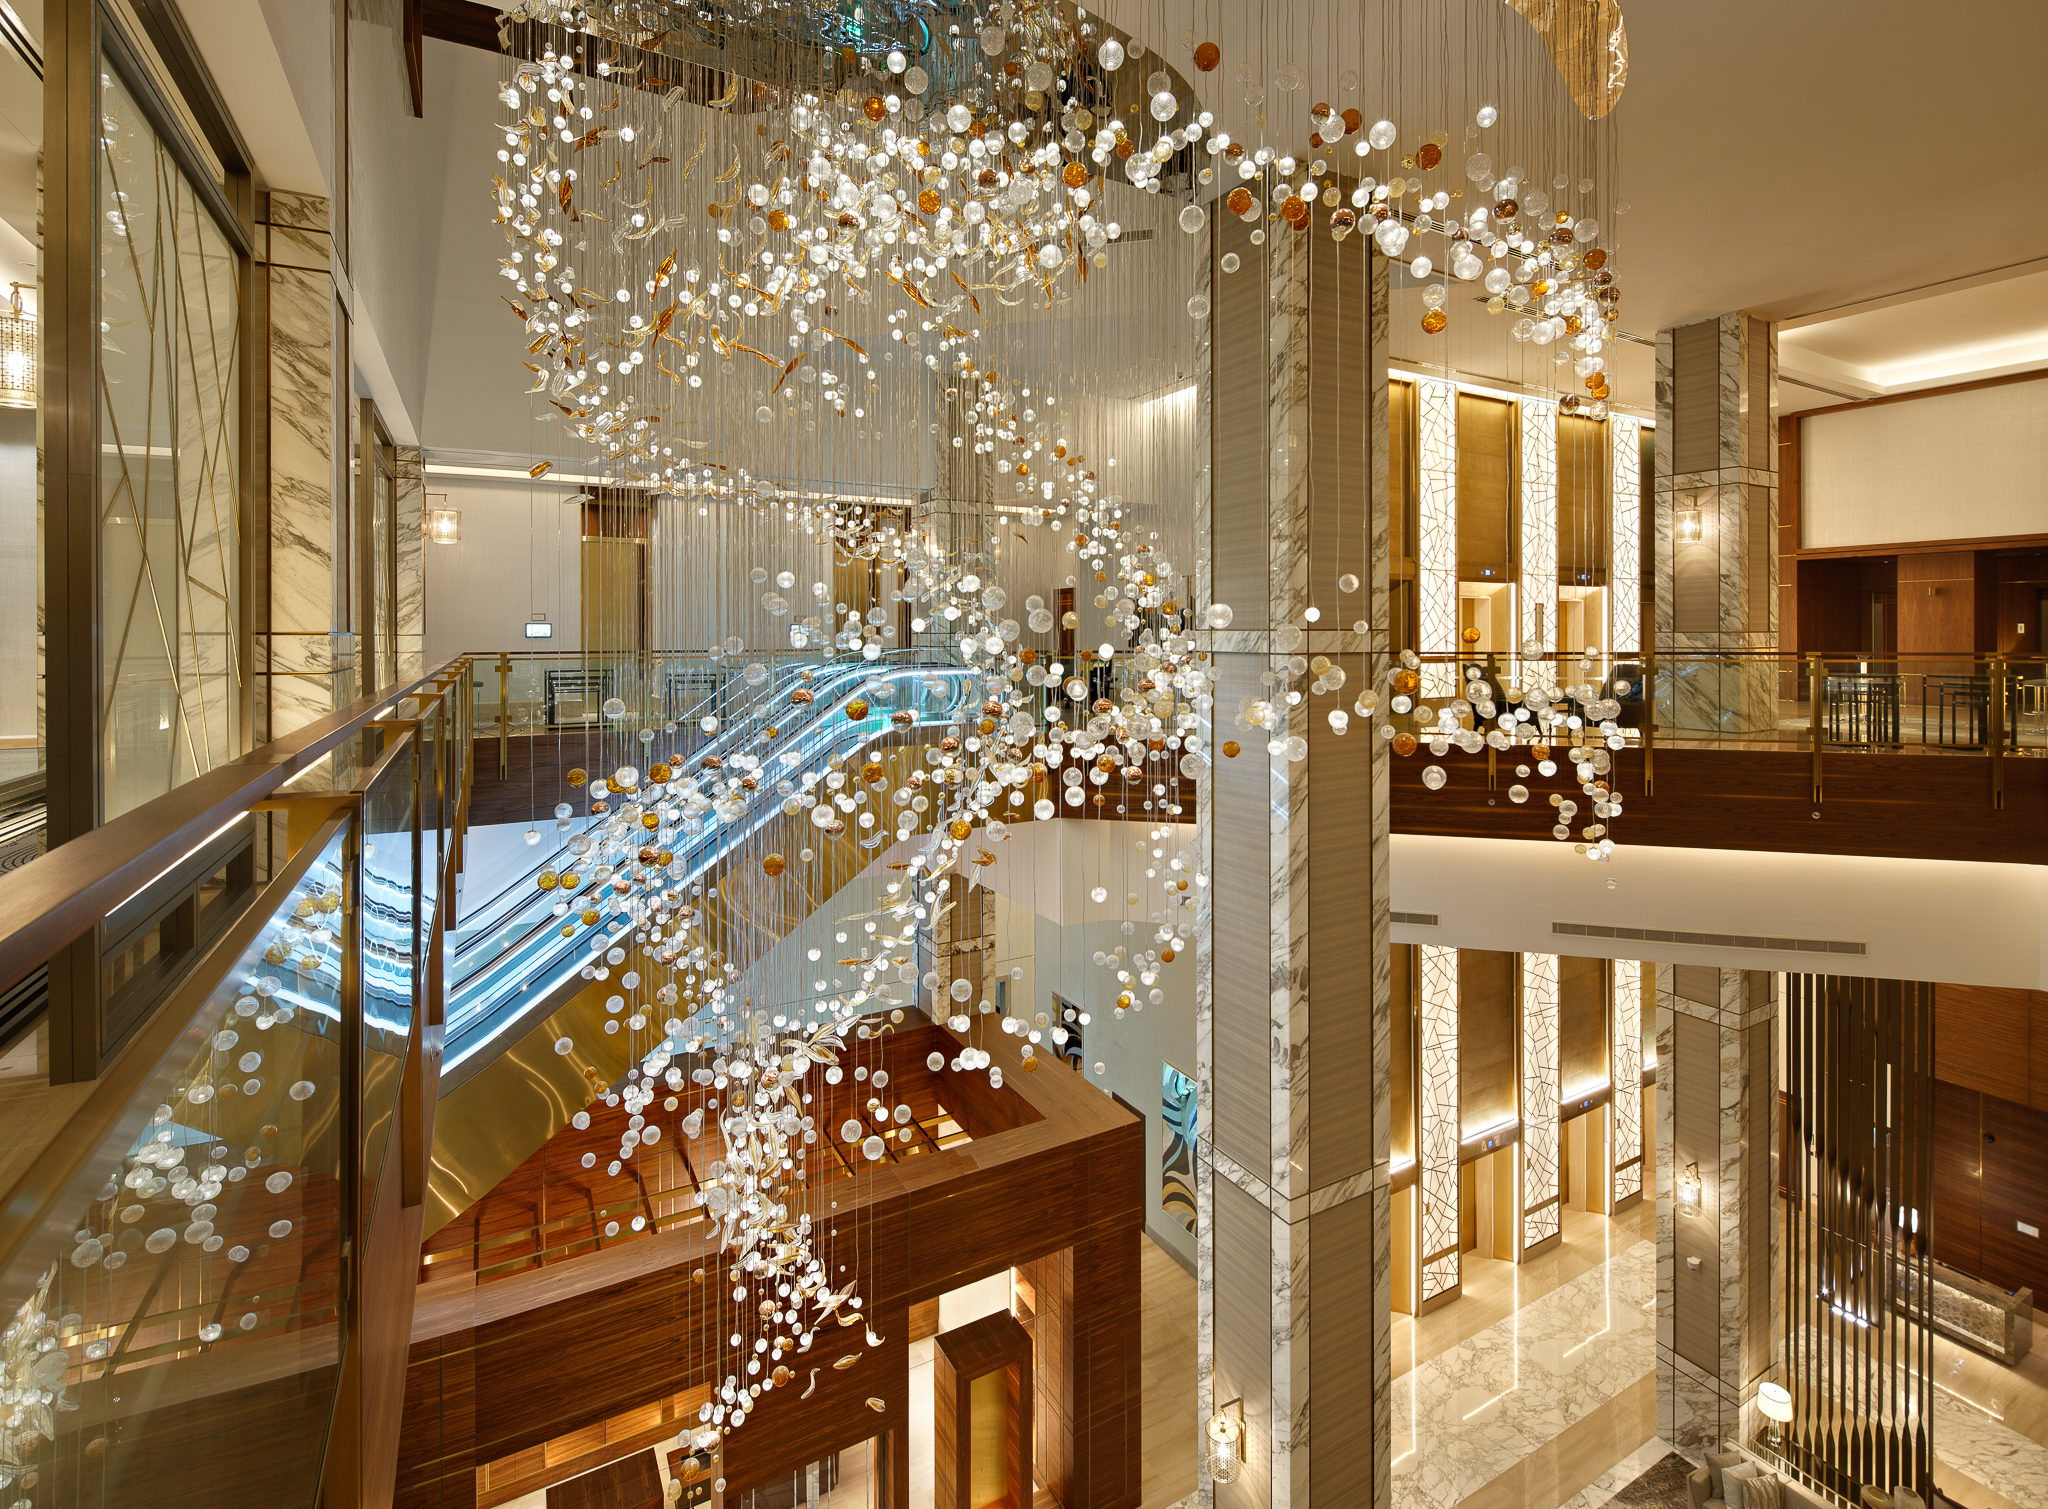 2019_2 DUBAI_MOVENPICK MEDIA CITY HOTEL_17GU004_01_4_2.jpg